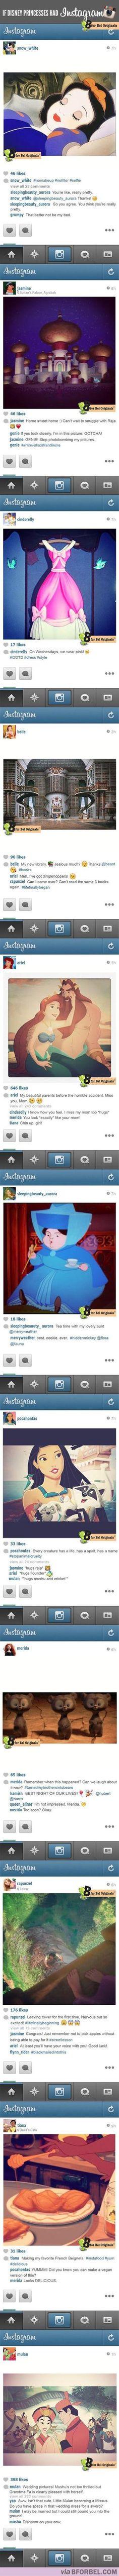 LOL! If Disney Princesses Had Instagram by kelly.meli